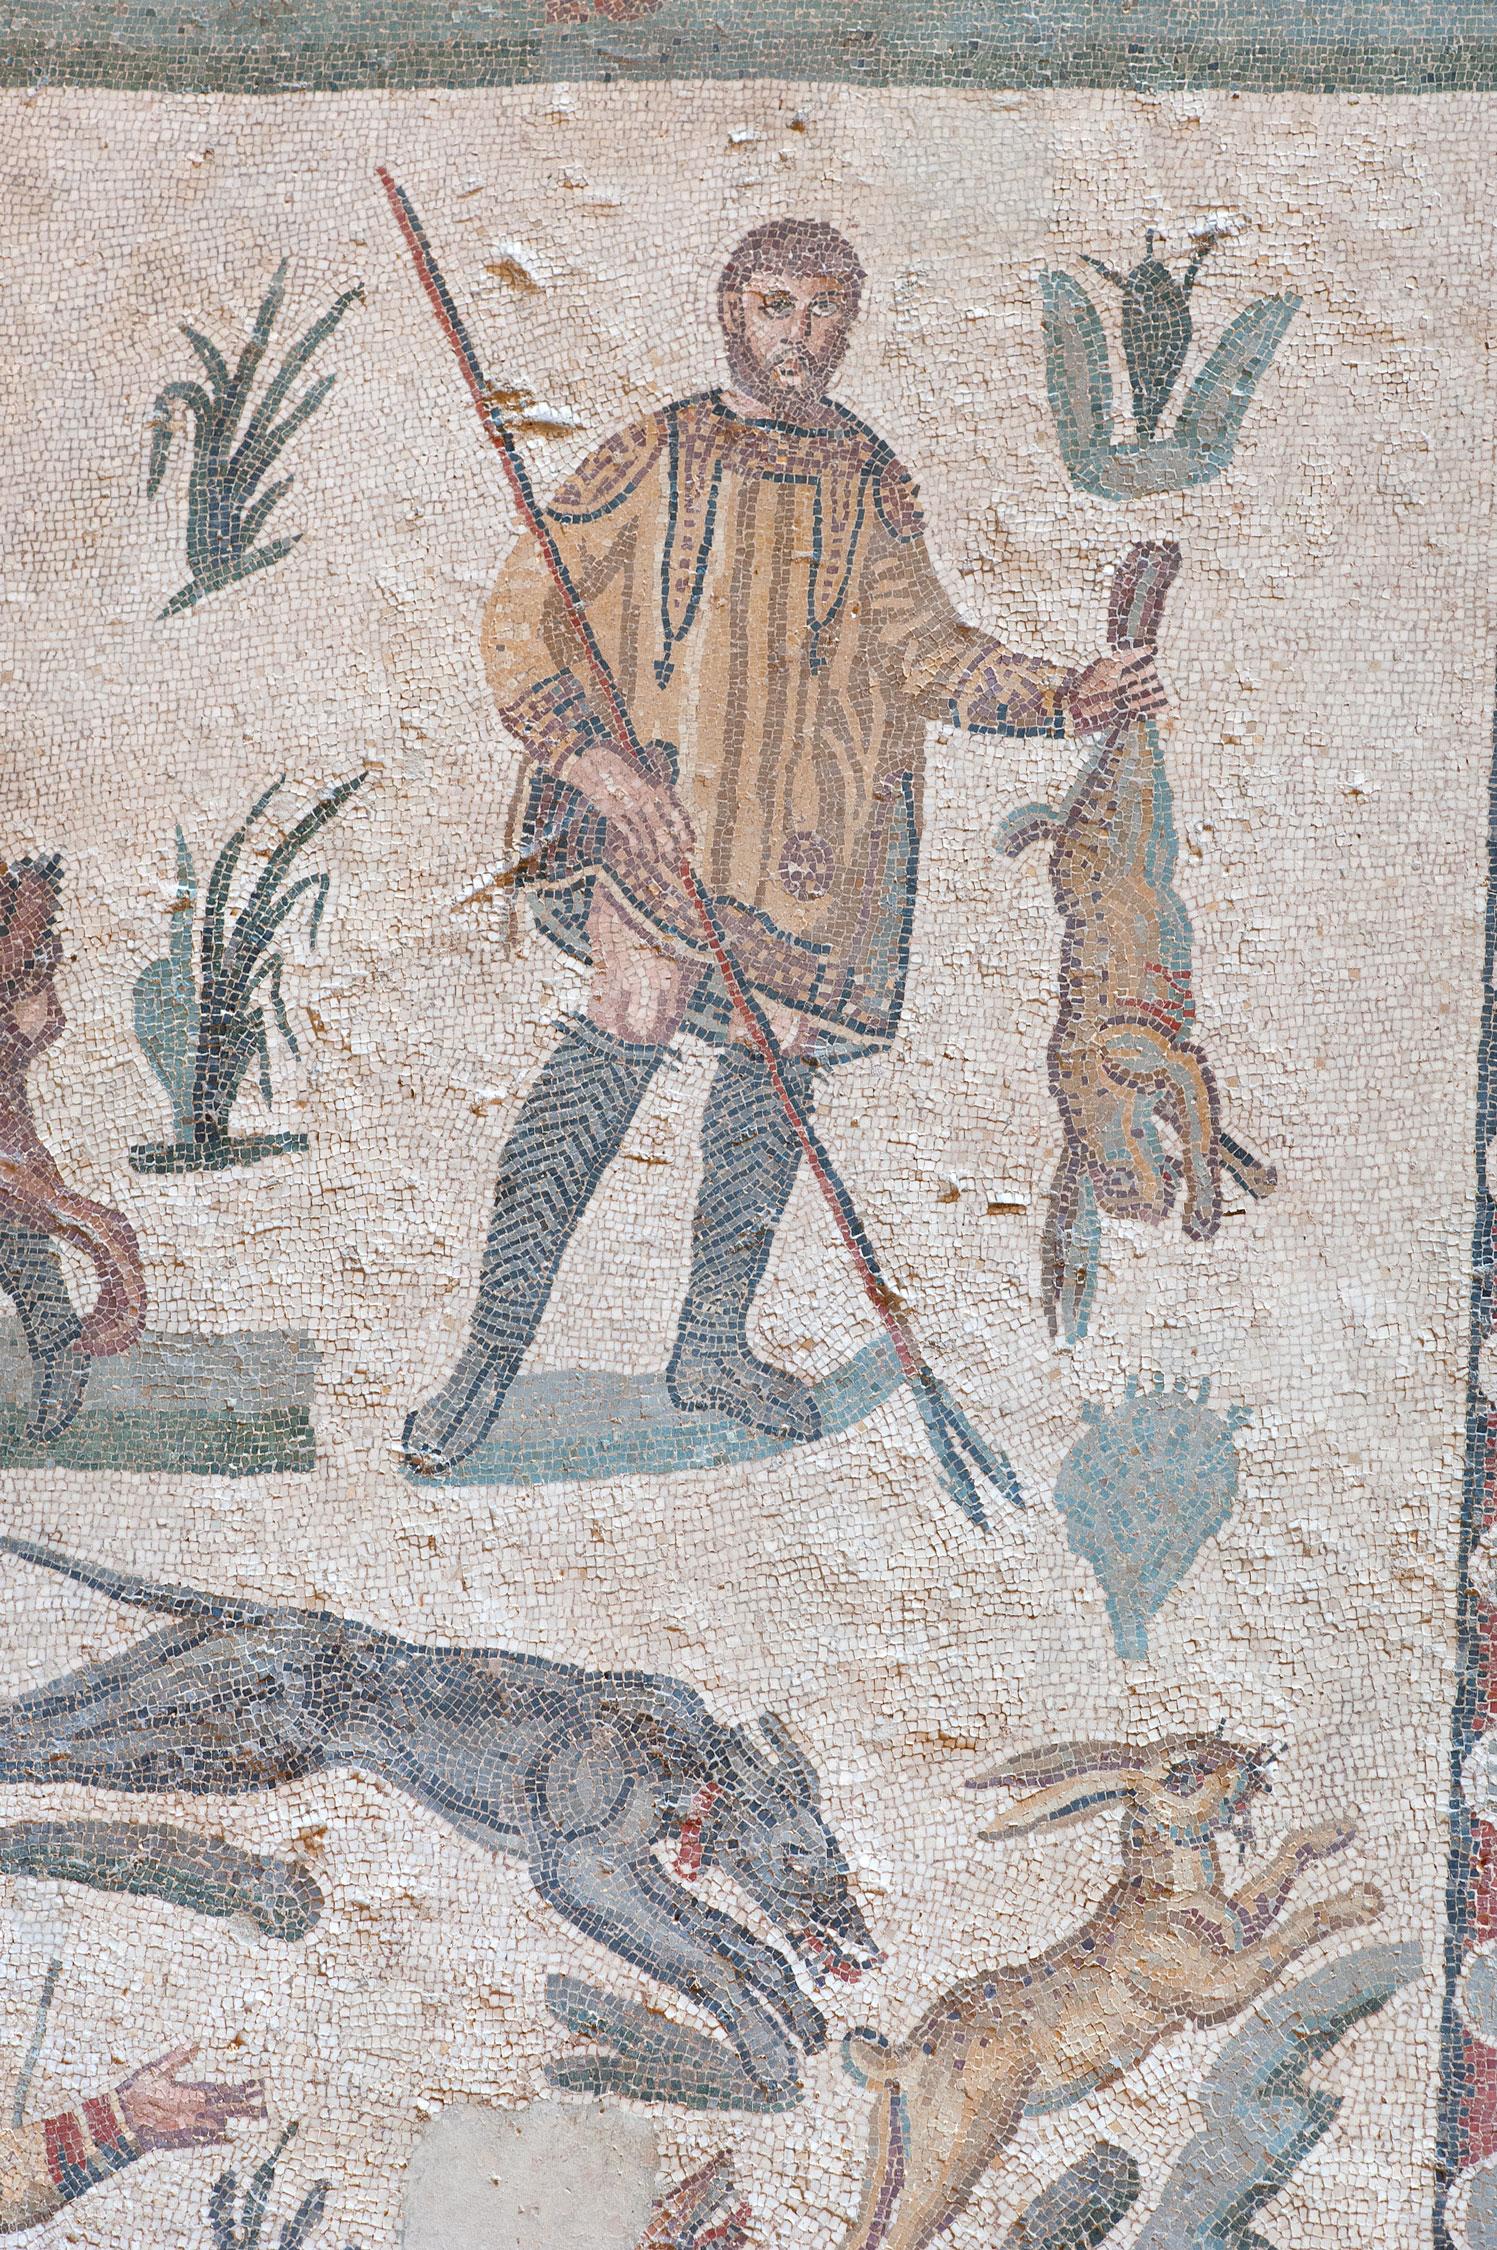 16_Sicily_Piazza_Armerina_3358